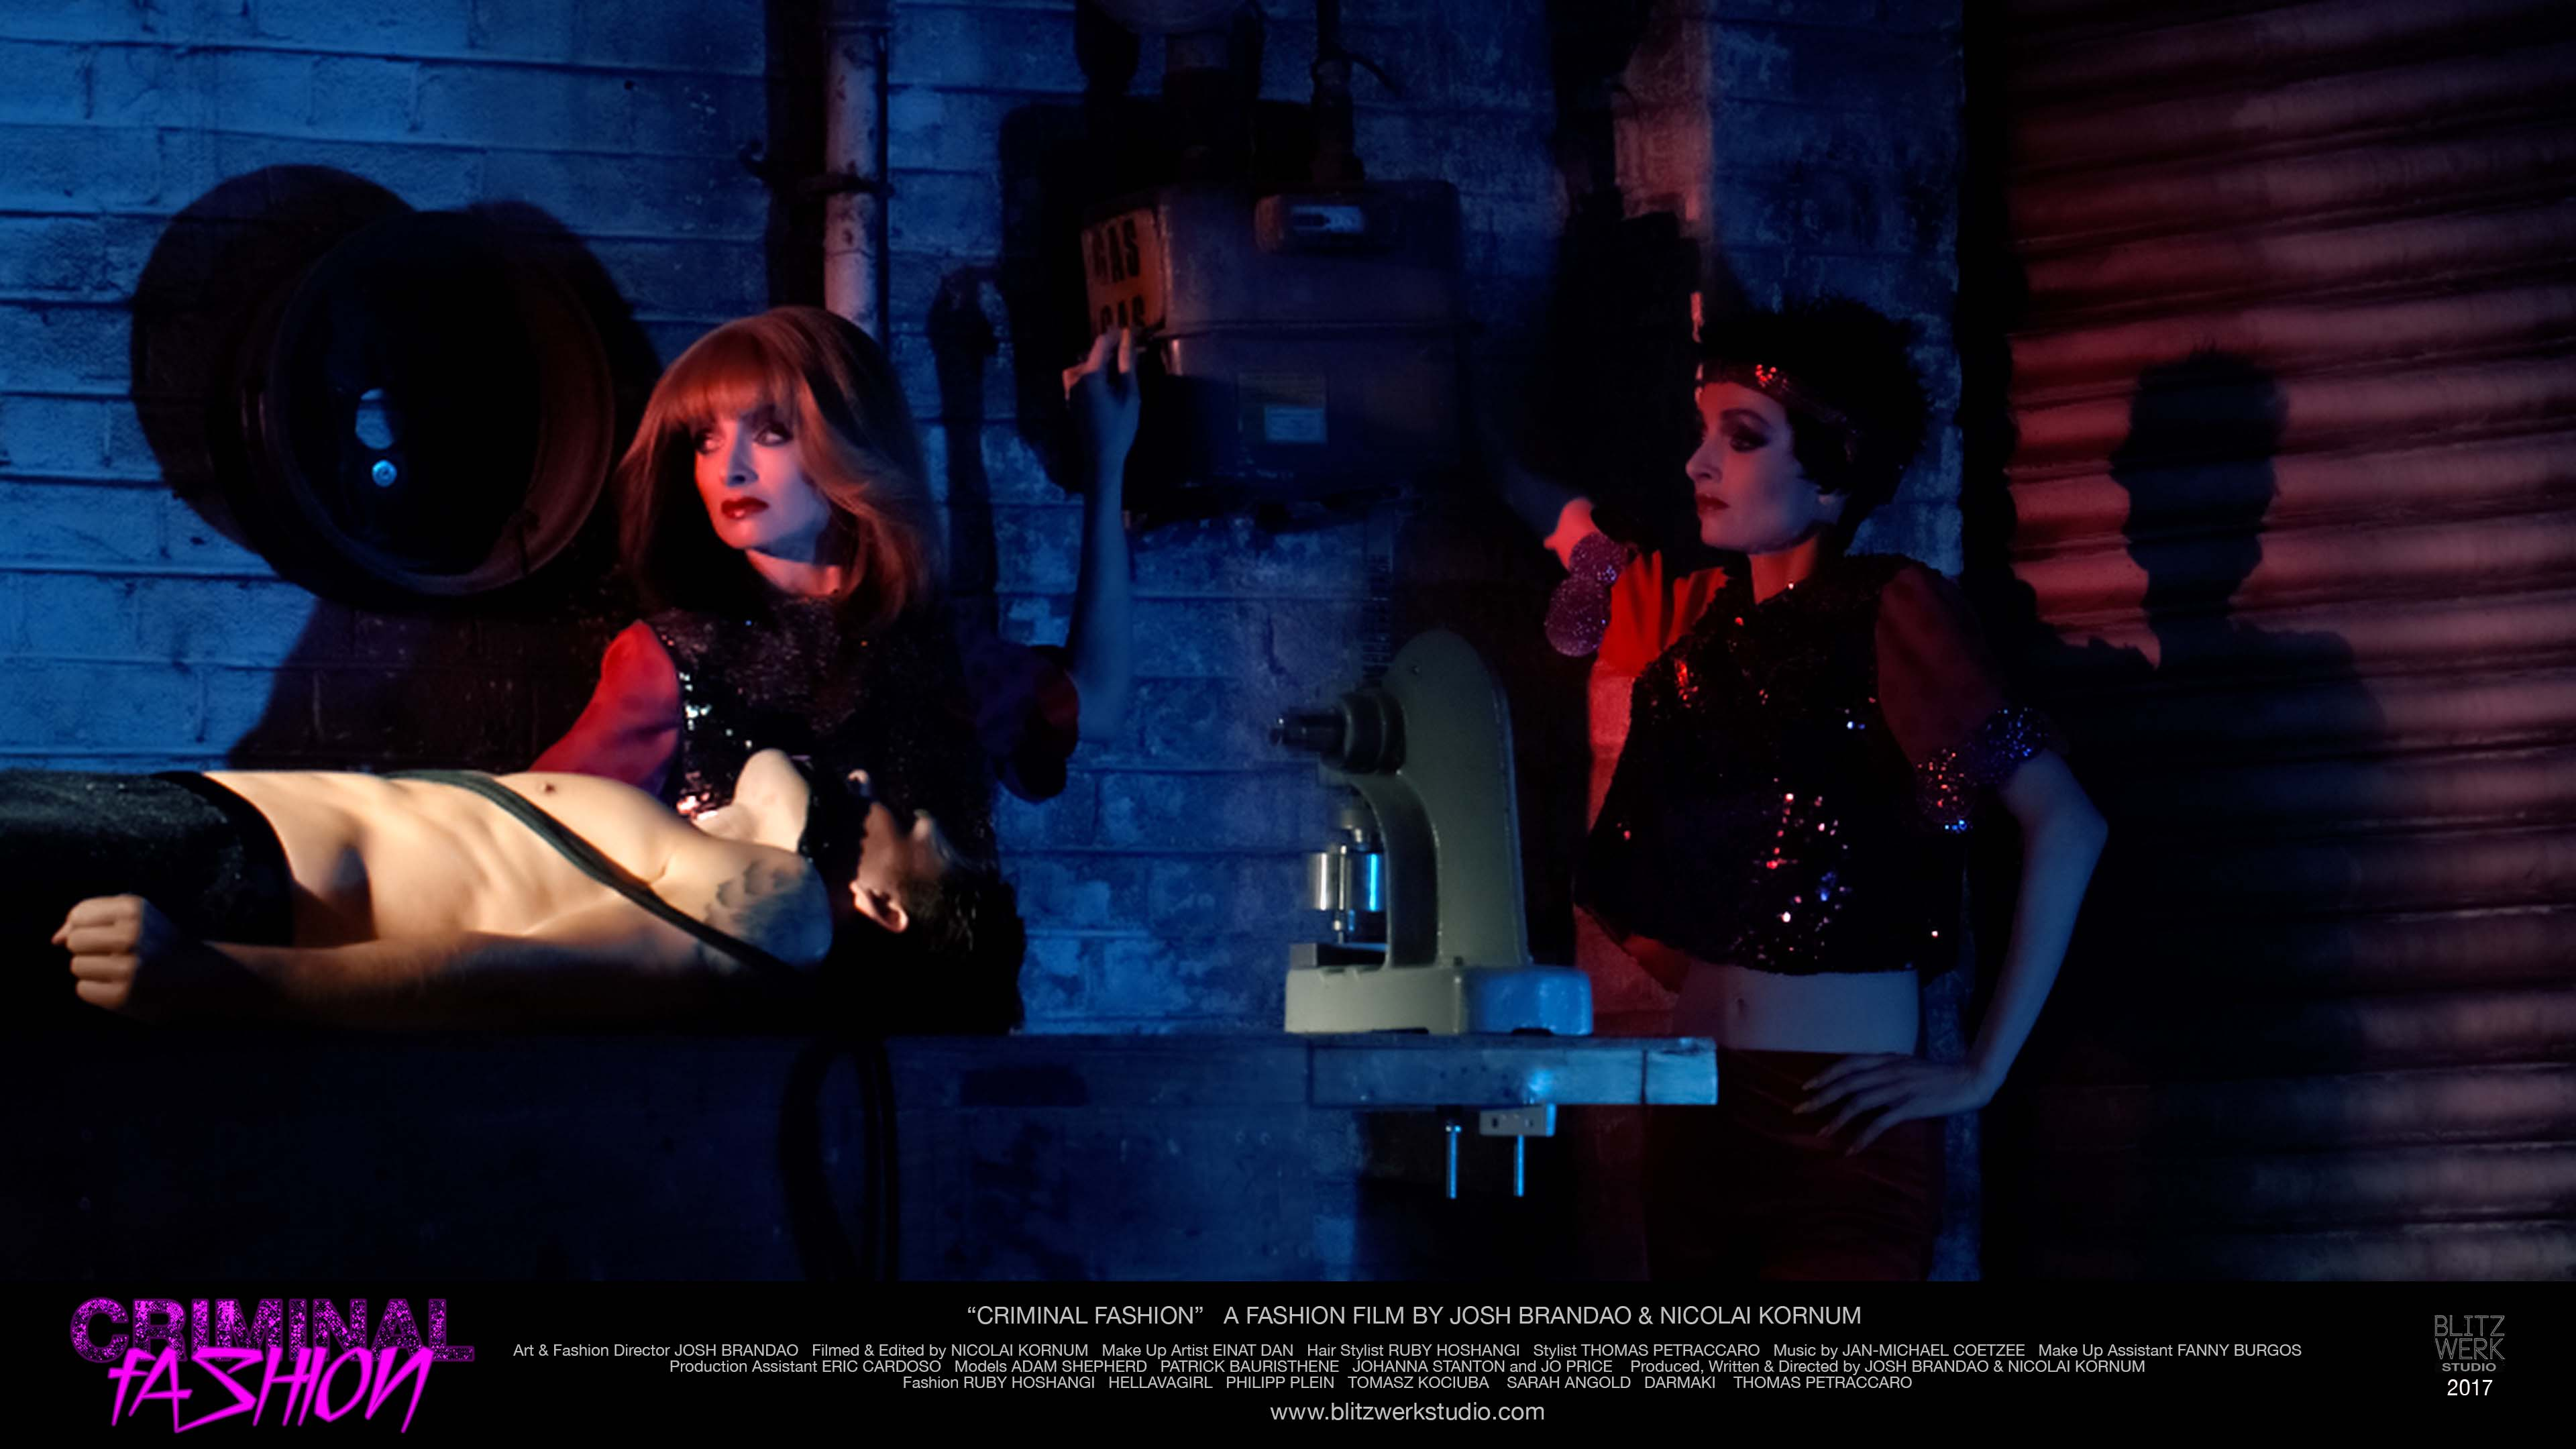 CRIMINAL FASHION PRODUCTION STILL (6) Johanna Stanton by Blitzwerk studio